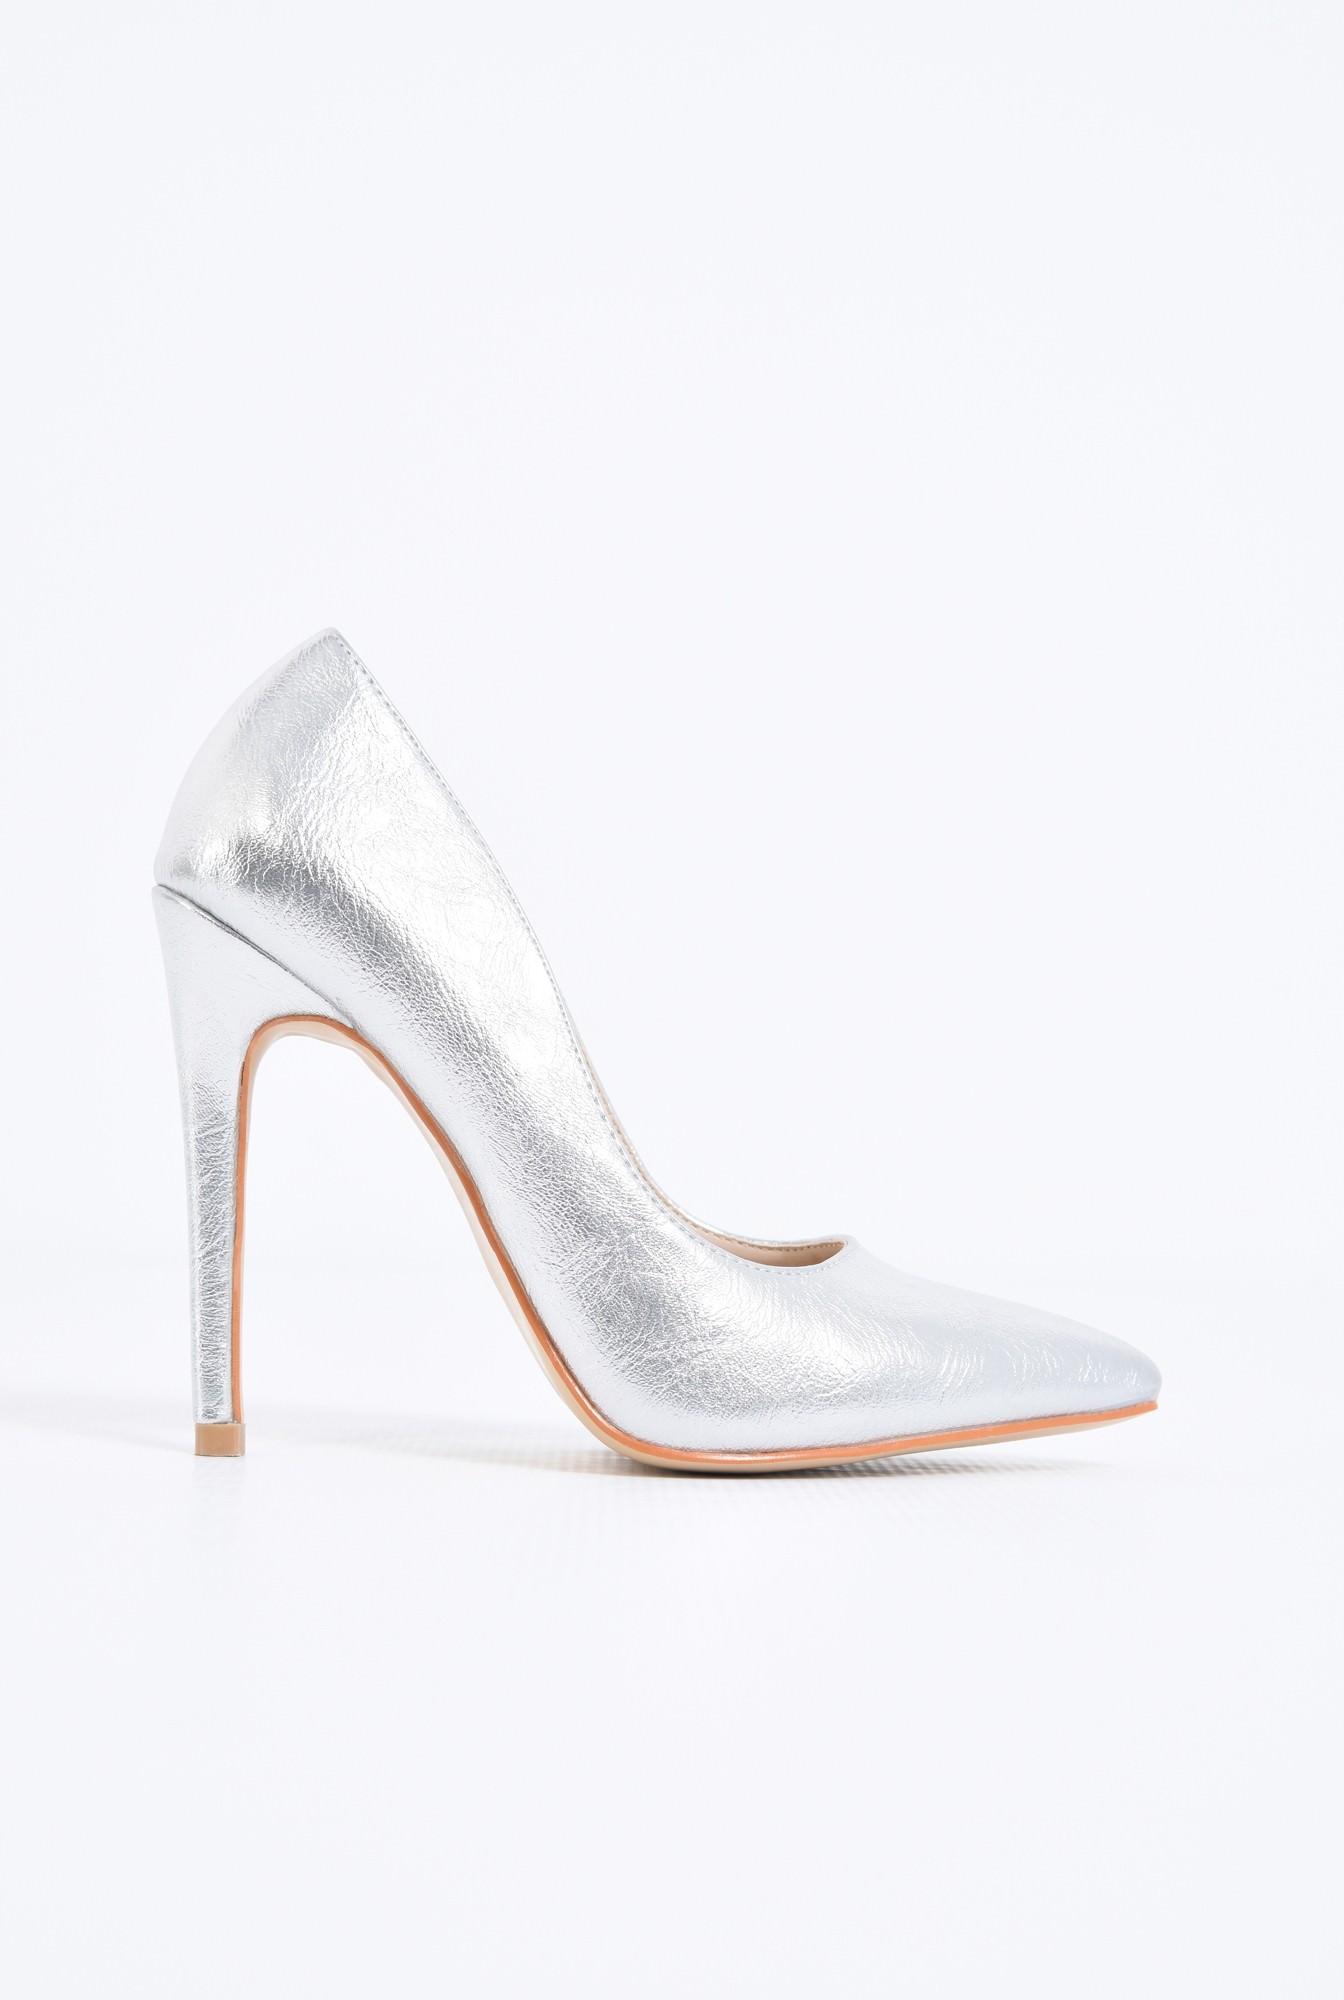 pantofi dama, stiletto, argintiu, metalic